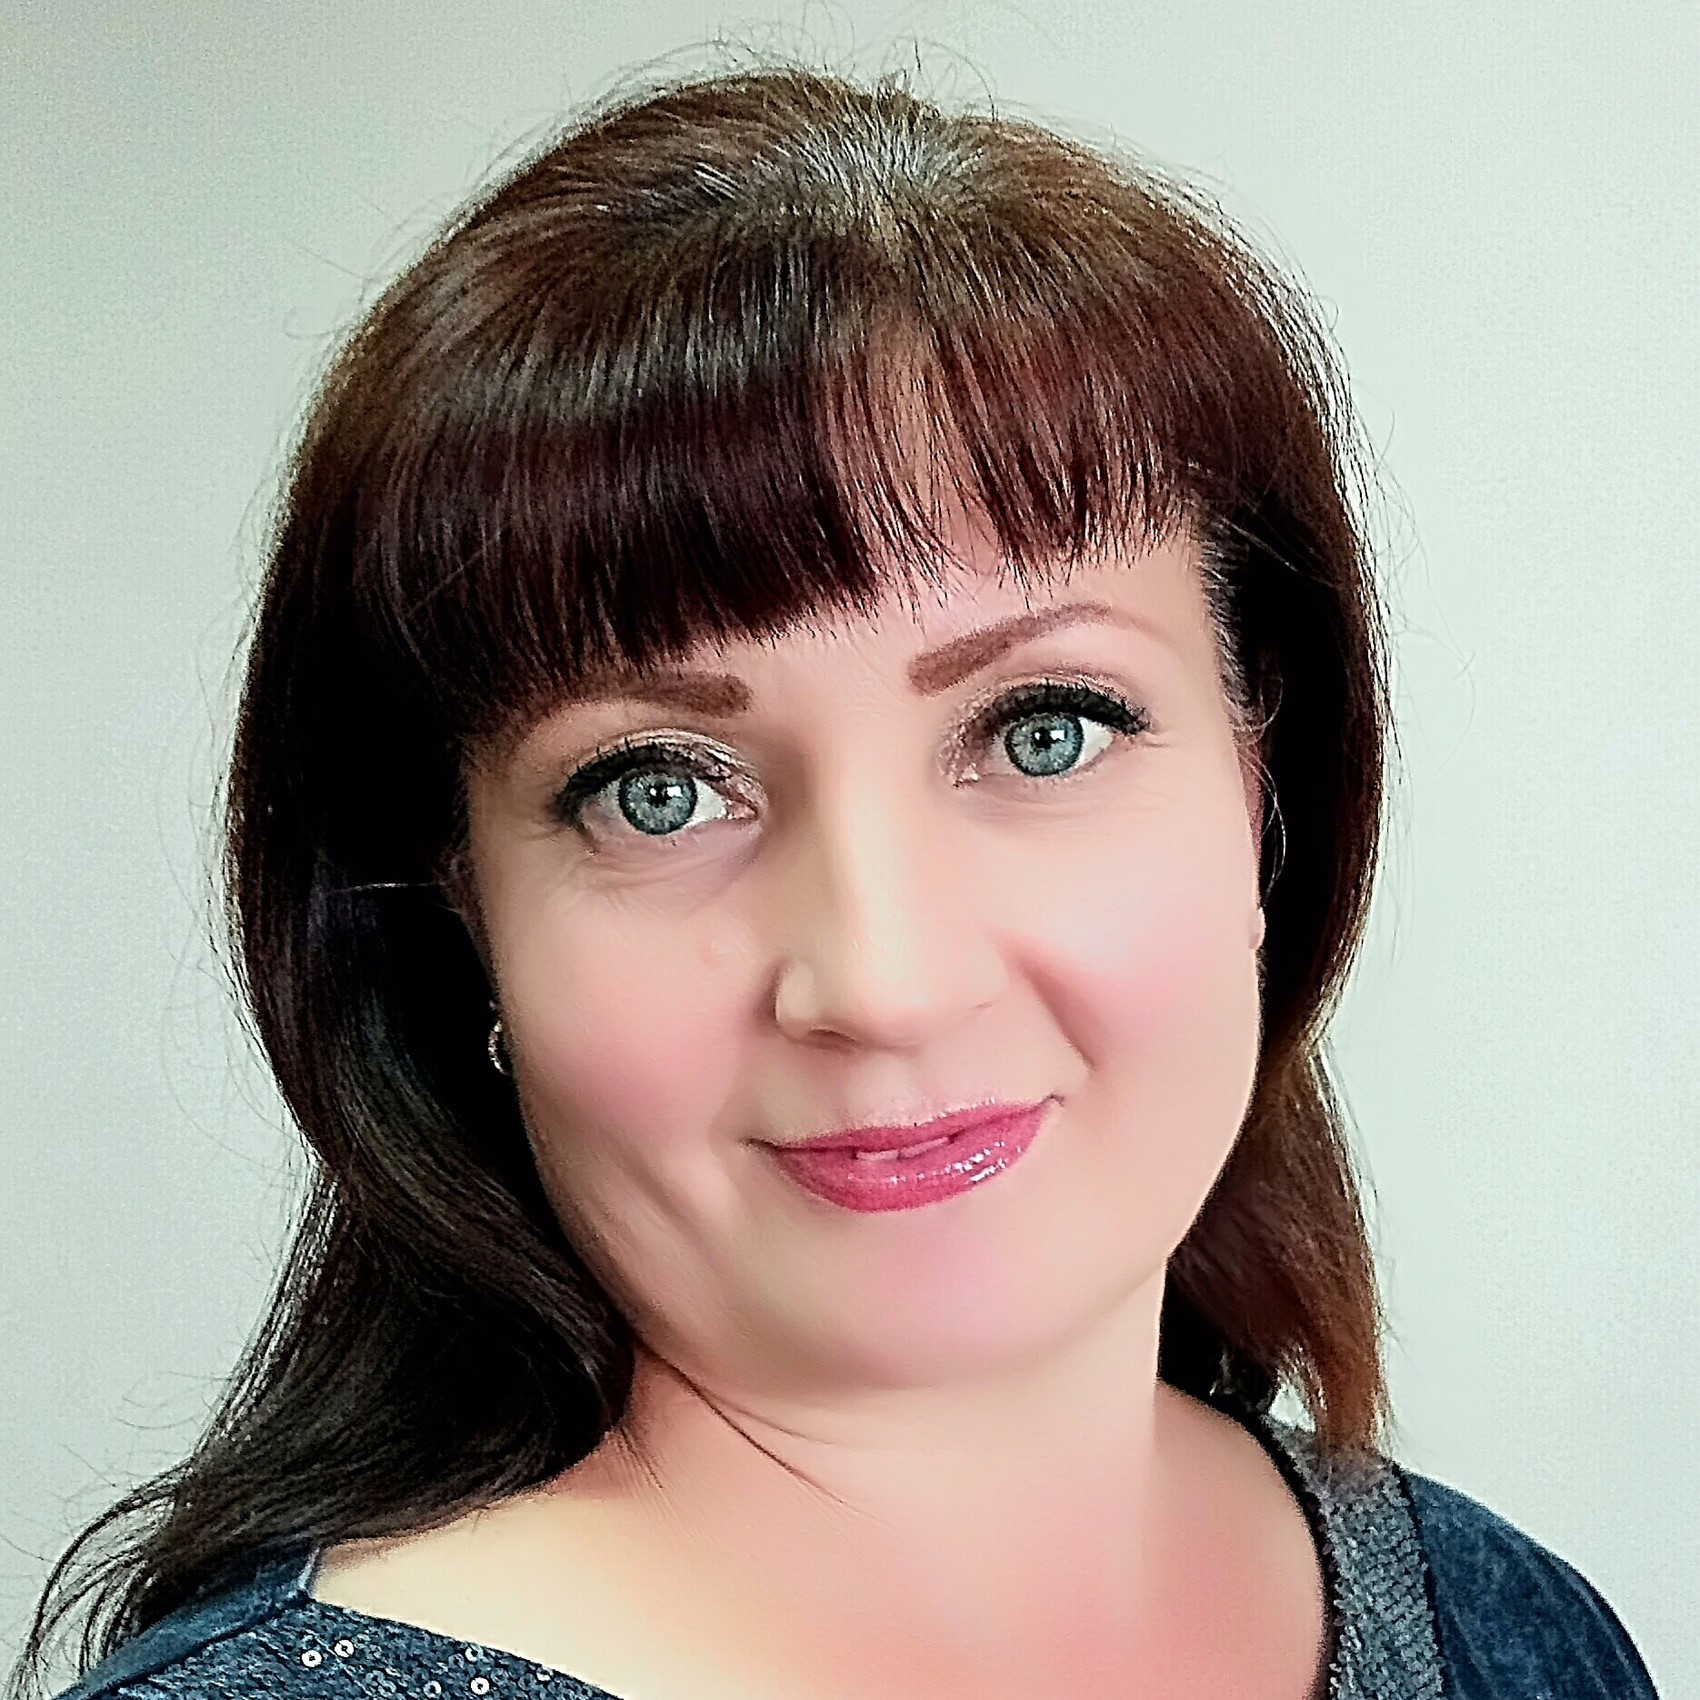 Марина Викторовна Ястребова